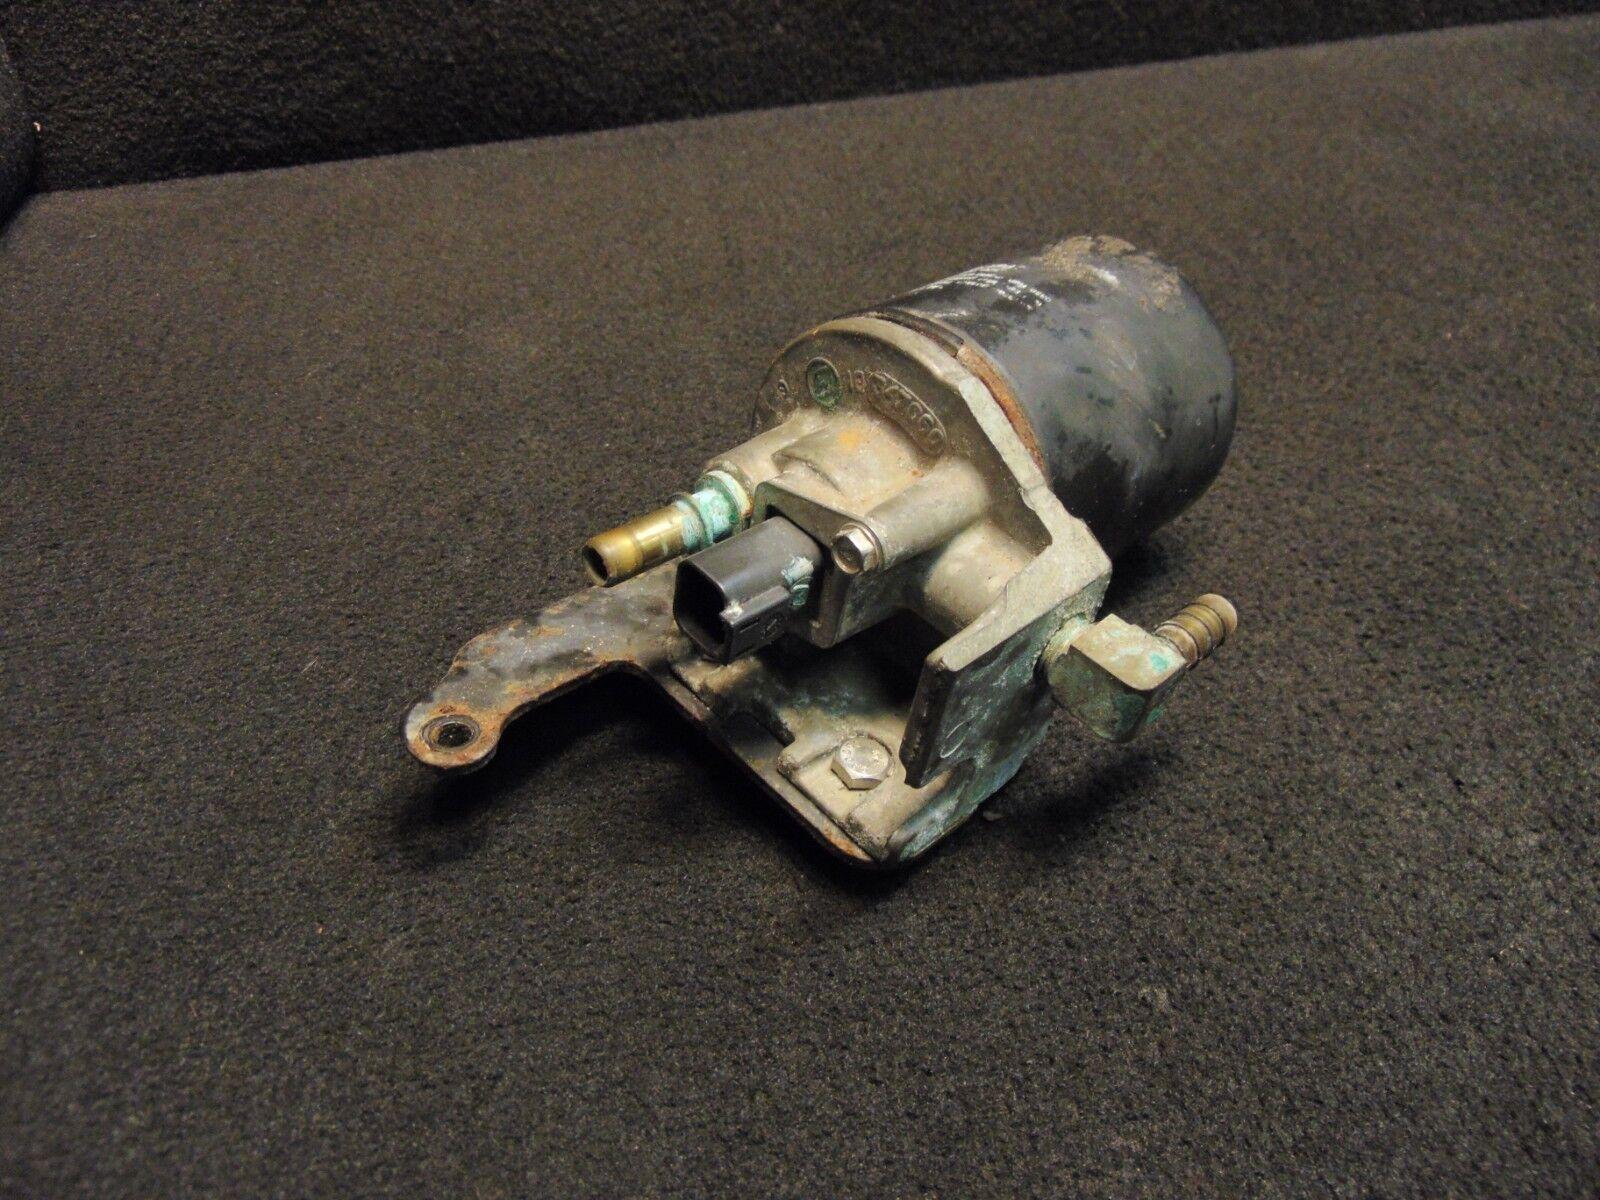 5001502 Water Sensor/Filter 1999-2003 200-250 HP Johnson Evinrude Outboard Part